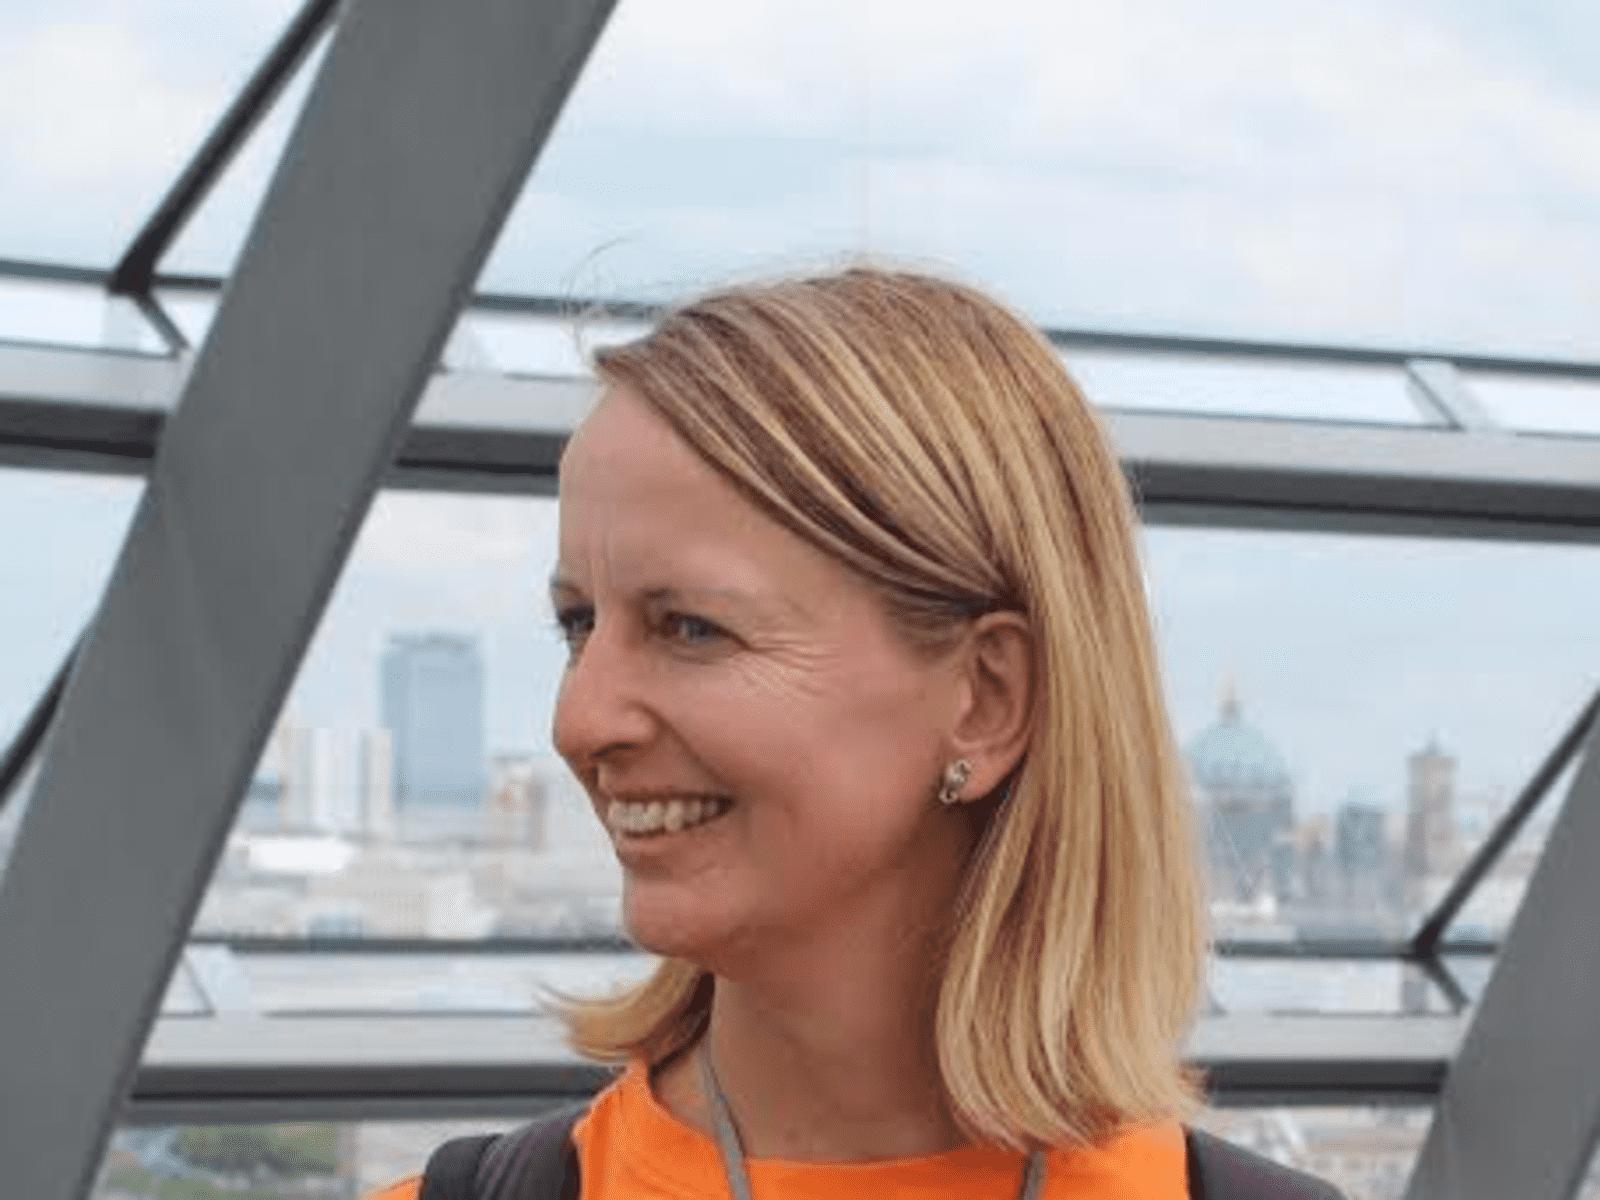 Sandra from Düsseldorf, Germany